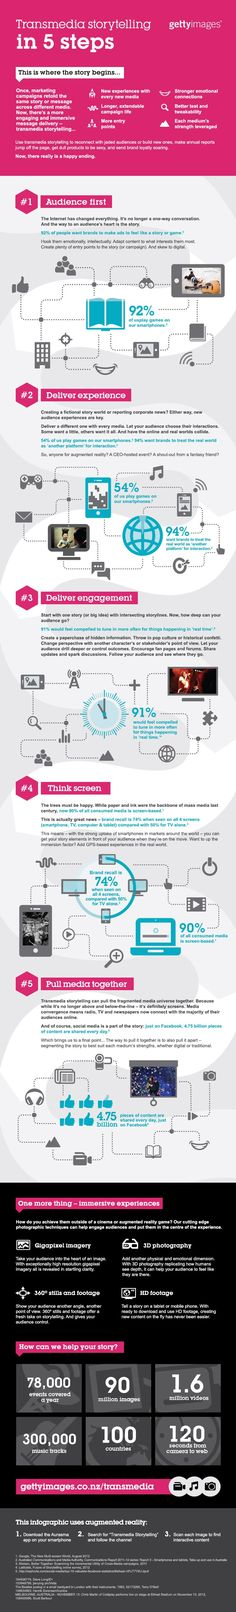 Transmedia storytelling in 5 steps - #infographic